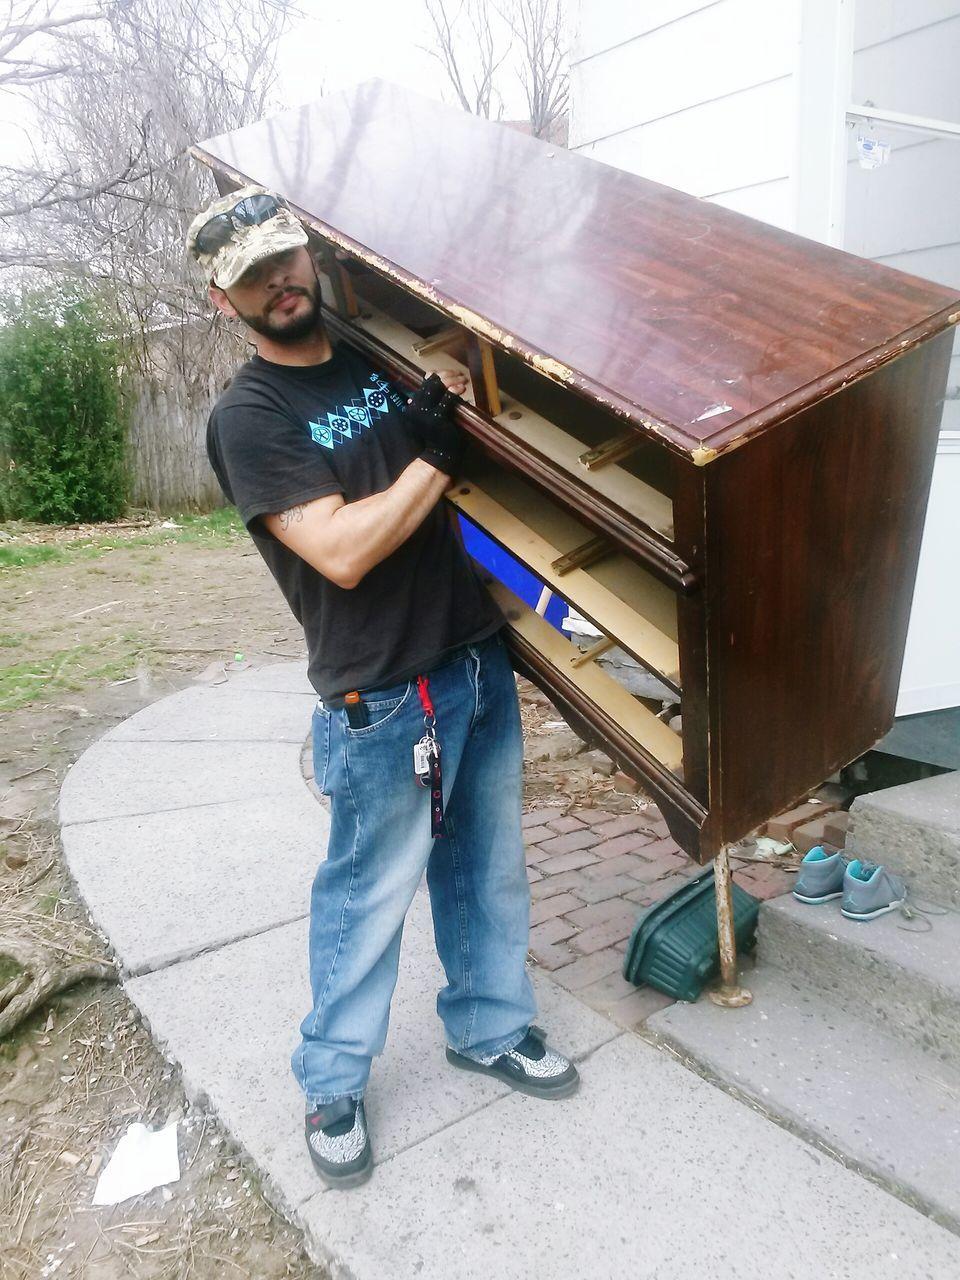 Man Holding Broken Furniture Outdoors